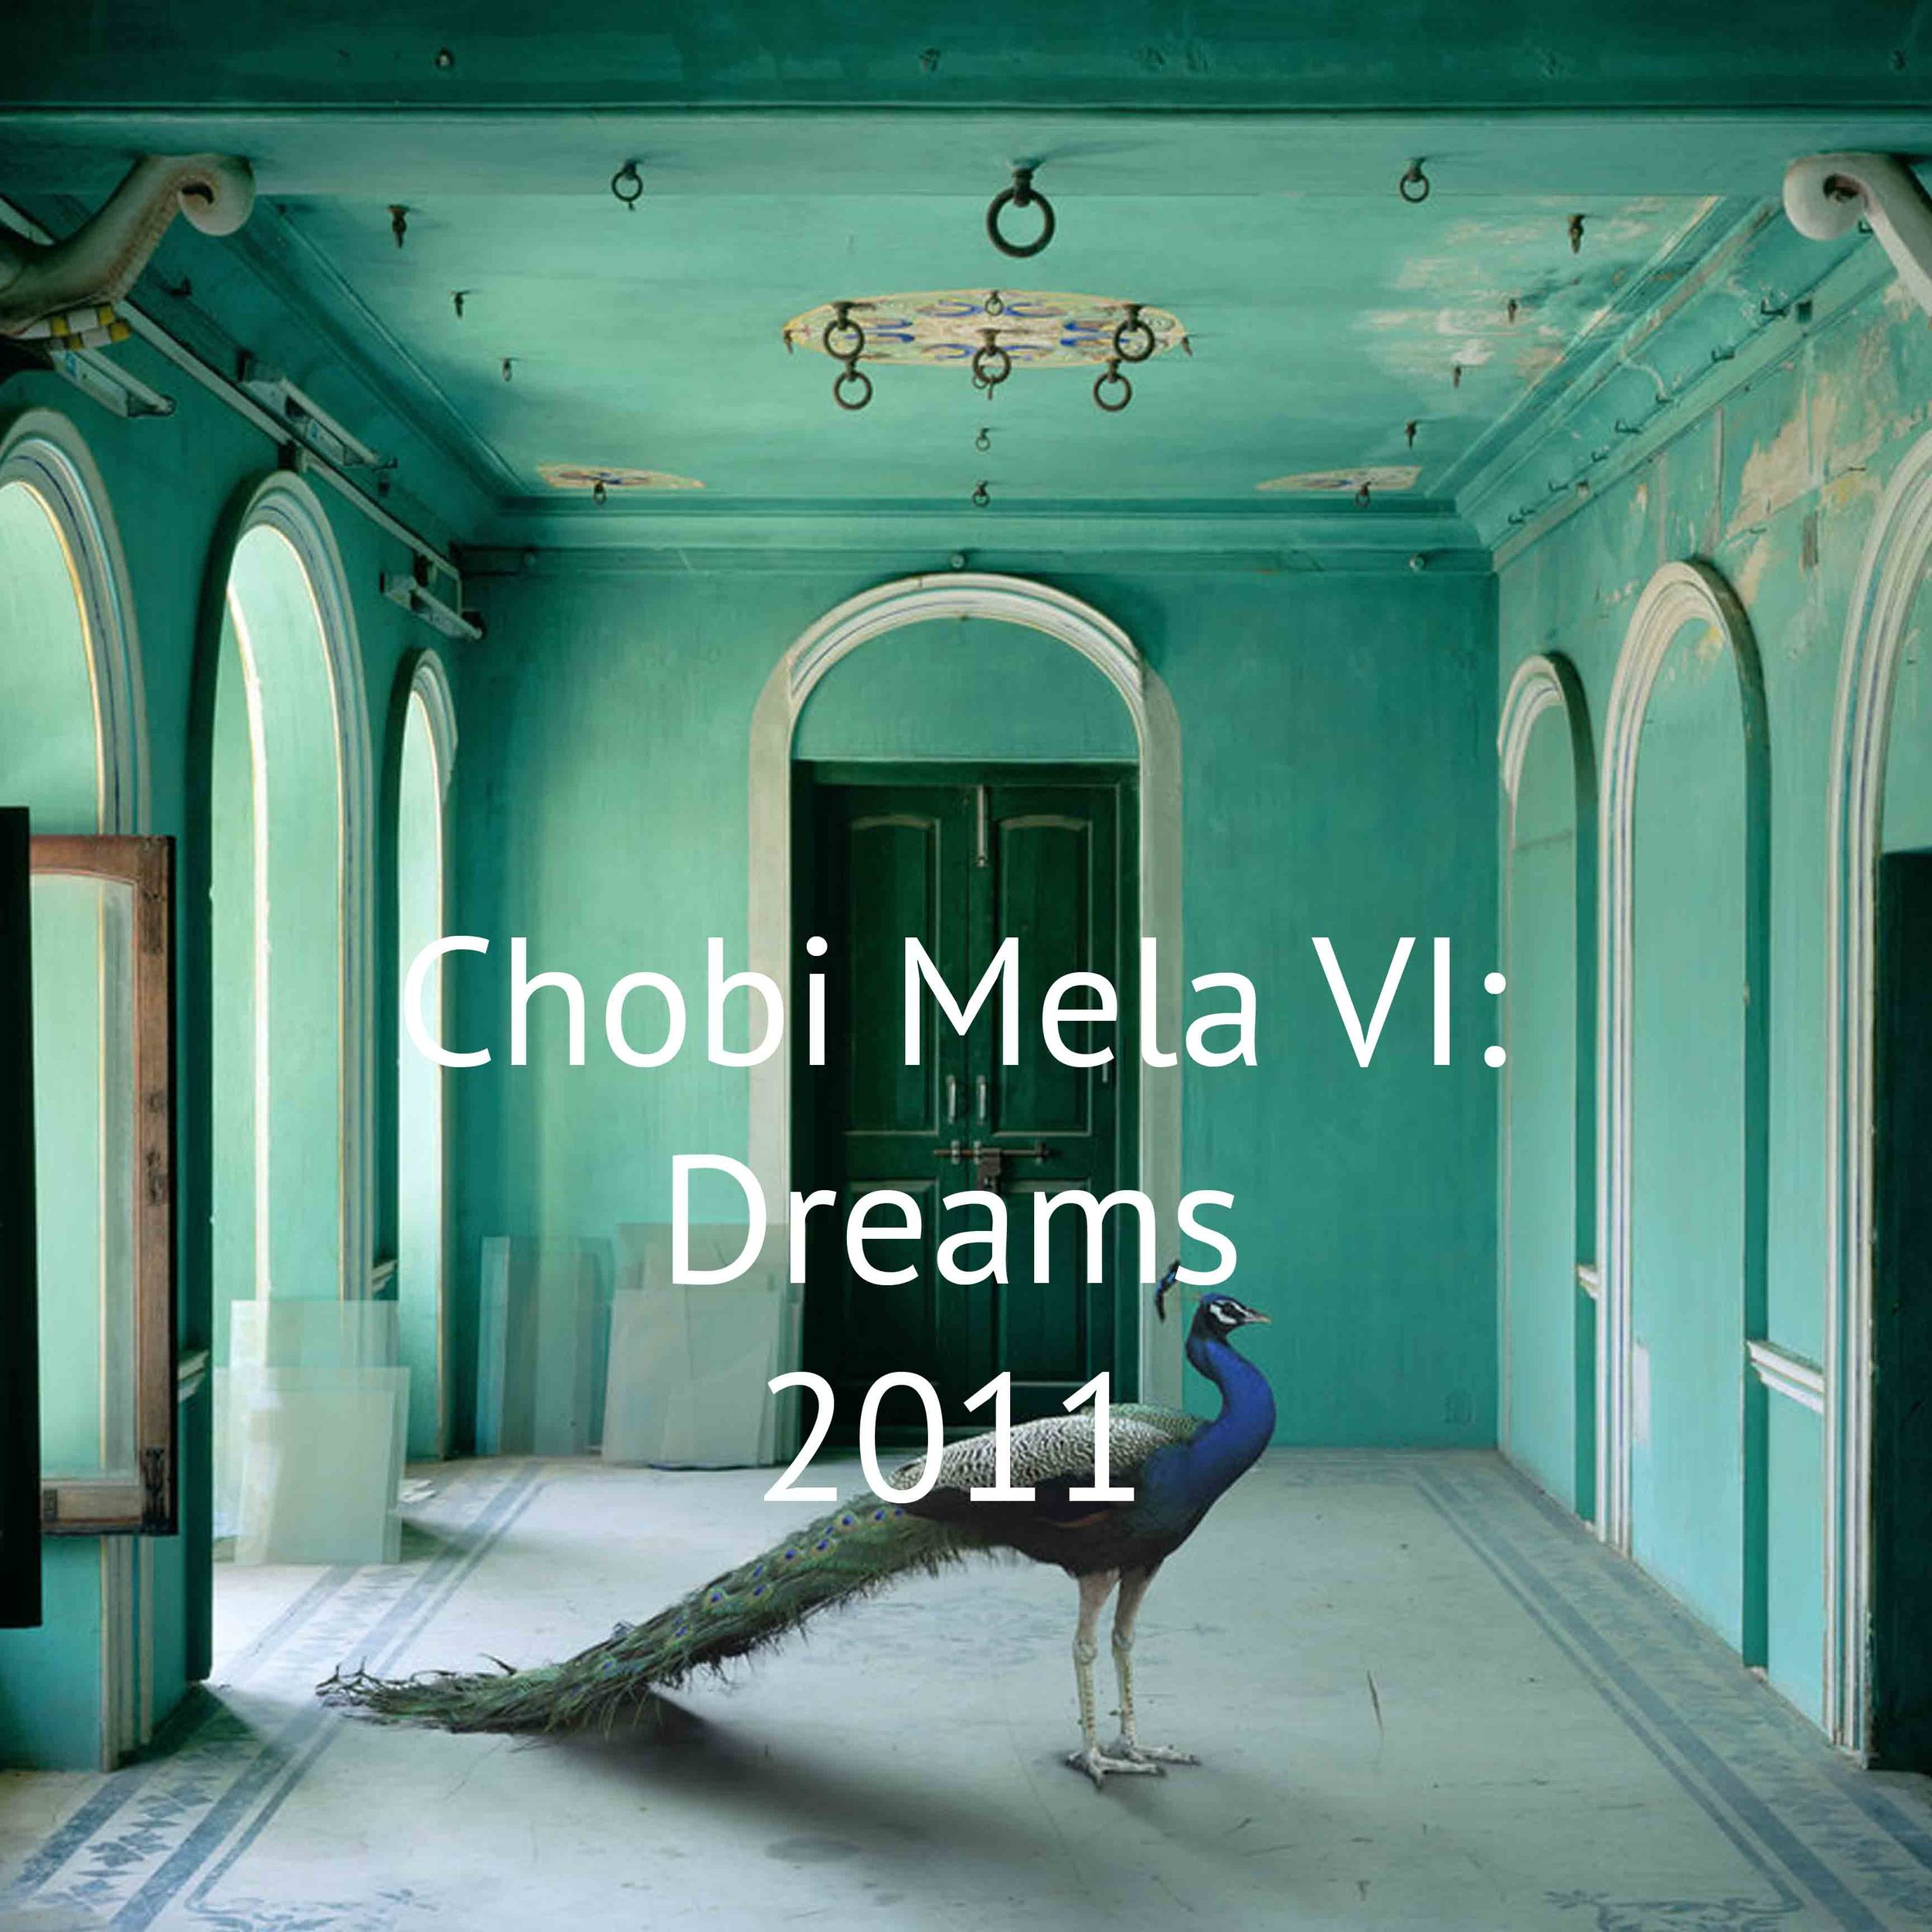 Chobi Mela VI: Dreams